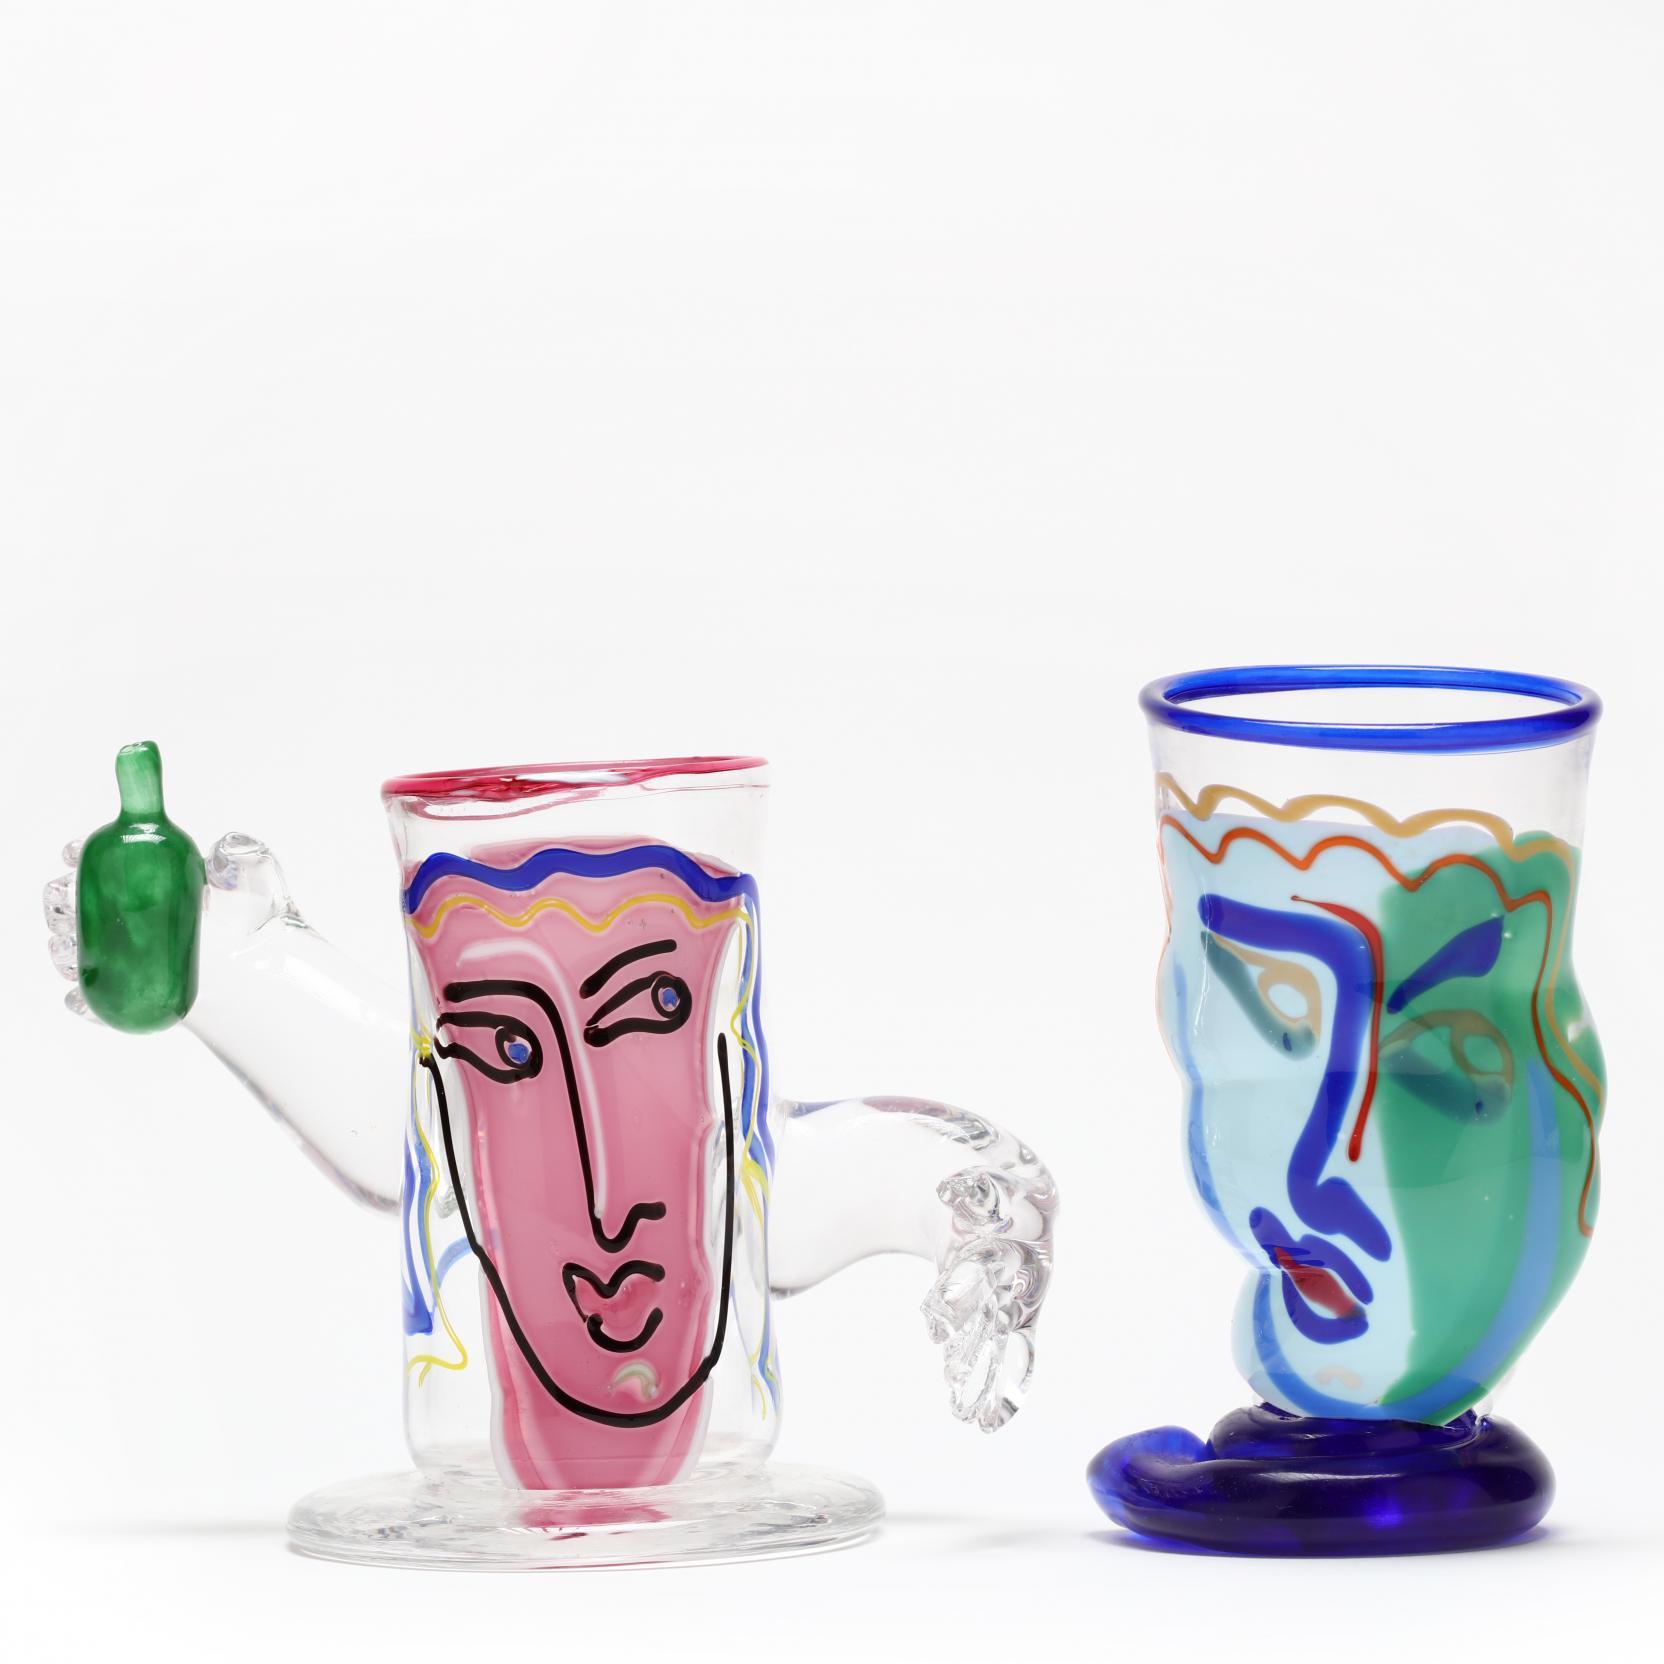 katherine-william-berstein-nj-nc-two-figural-art-glasses